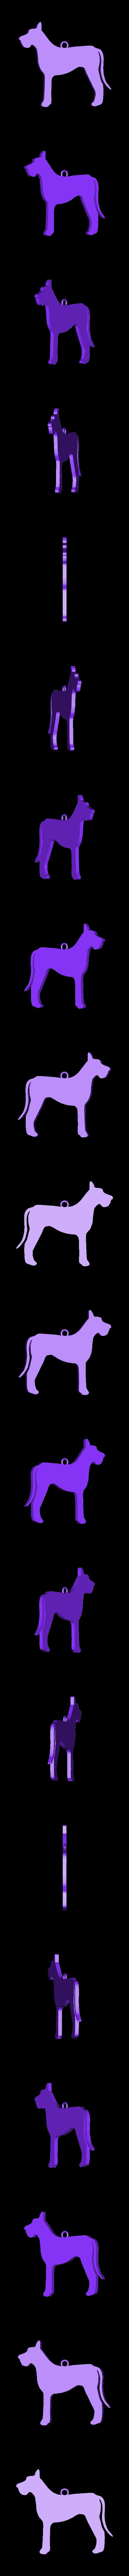 37.stl Download STL file Dogs • 3D printing object, GENNADI3313